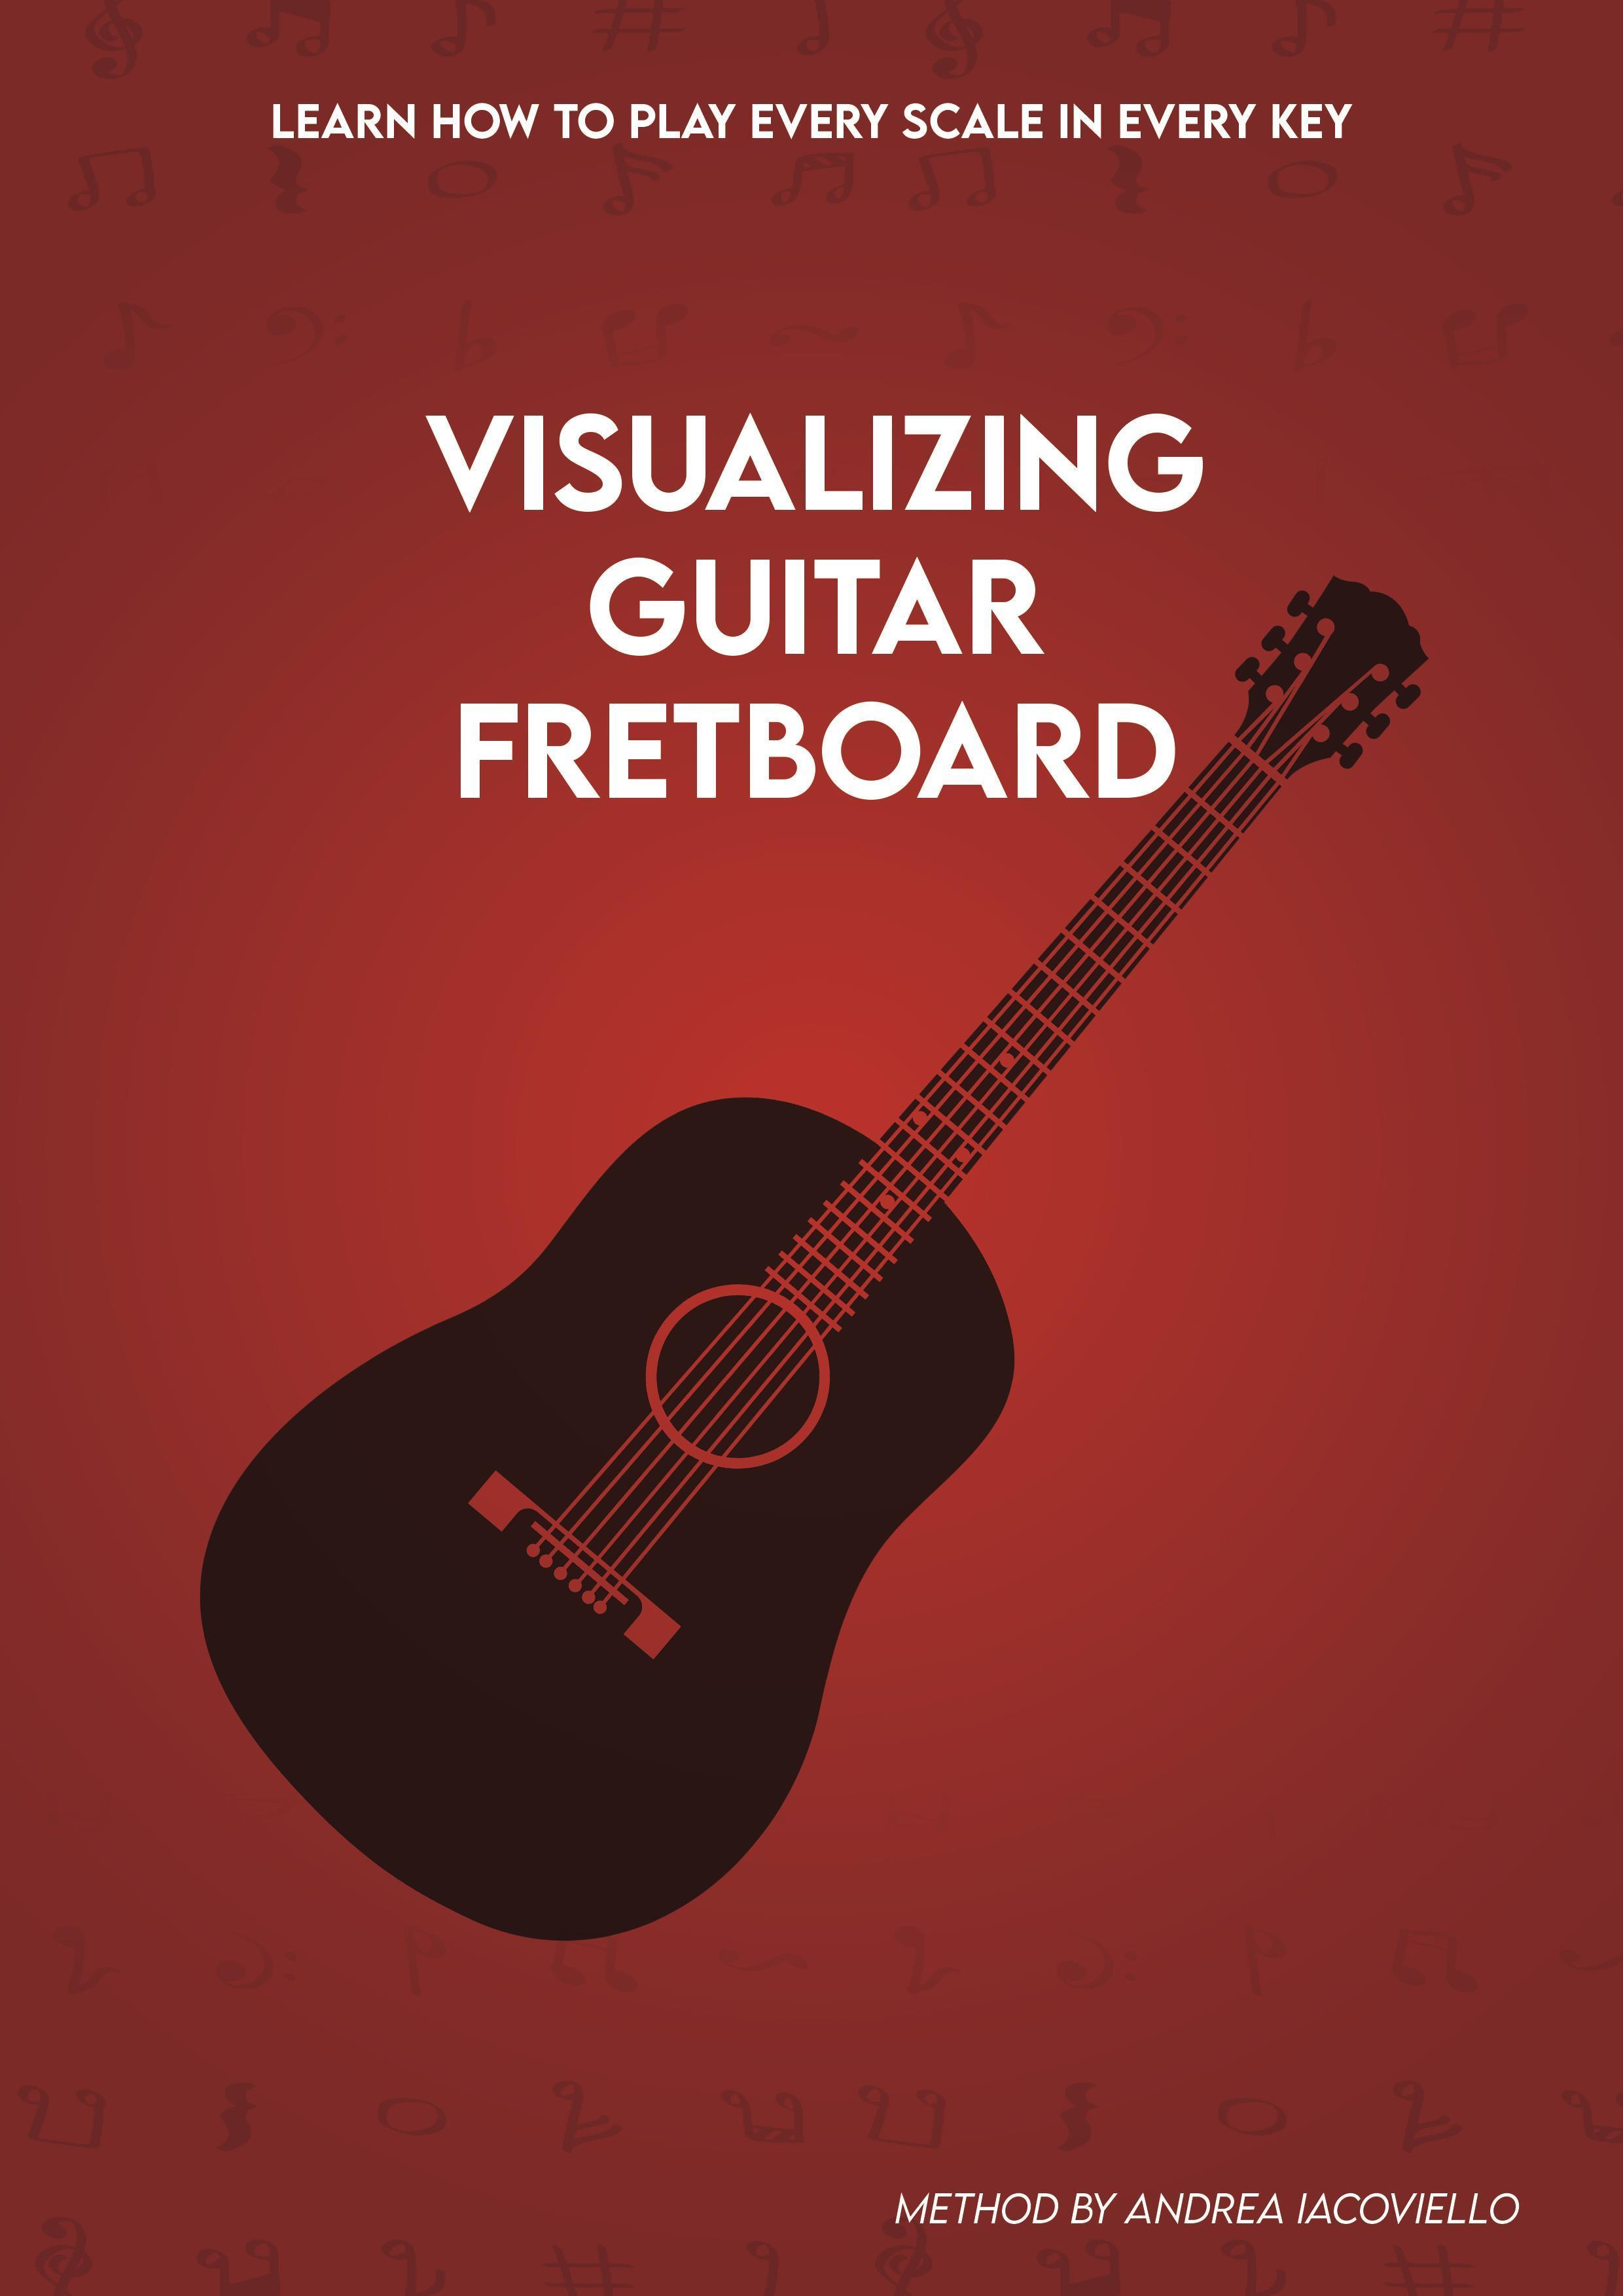 Visualizing Guitar Fretboard